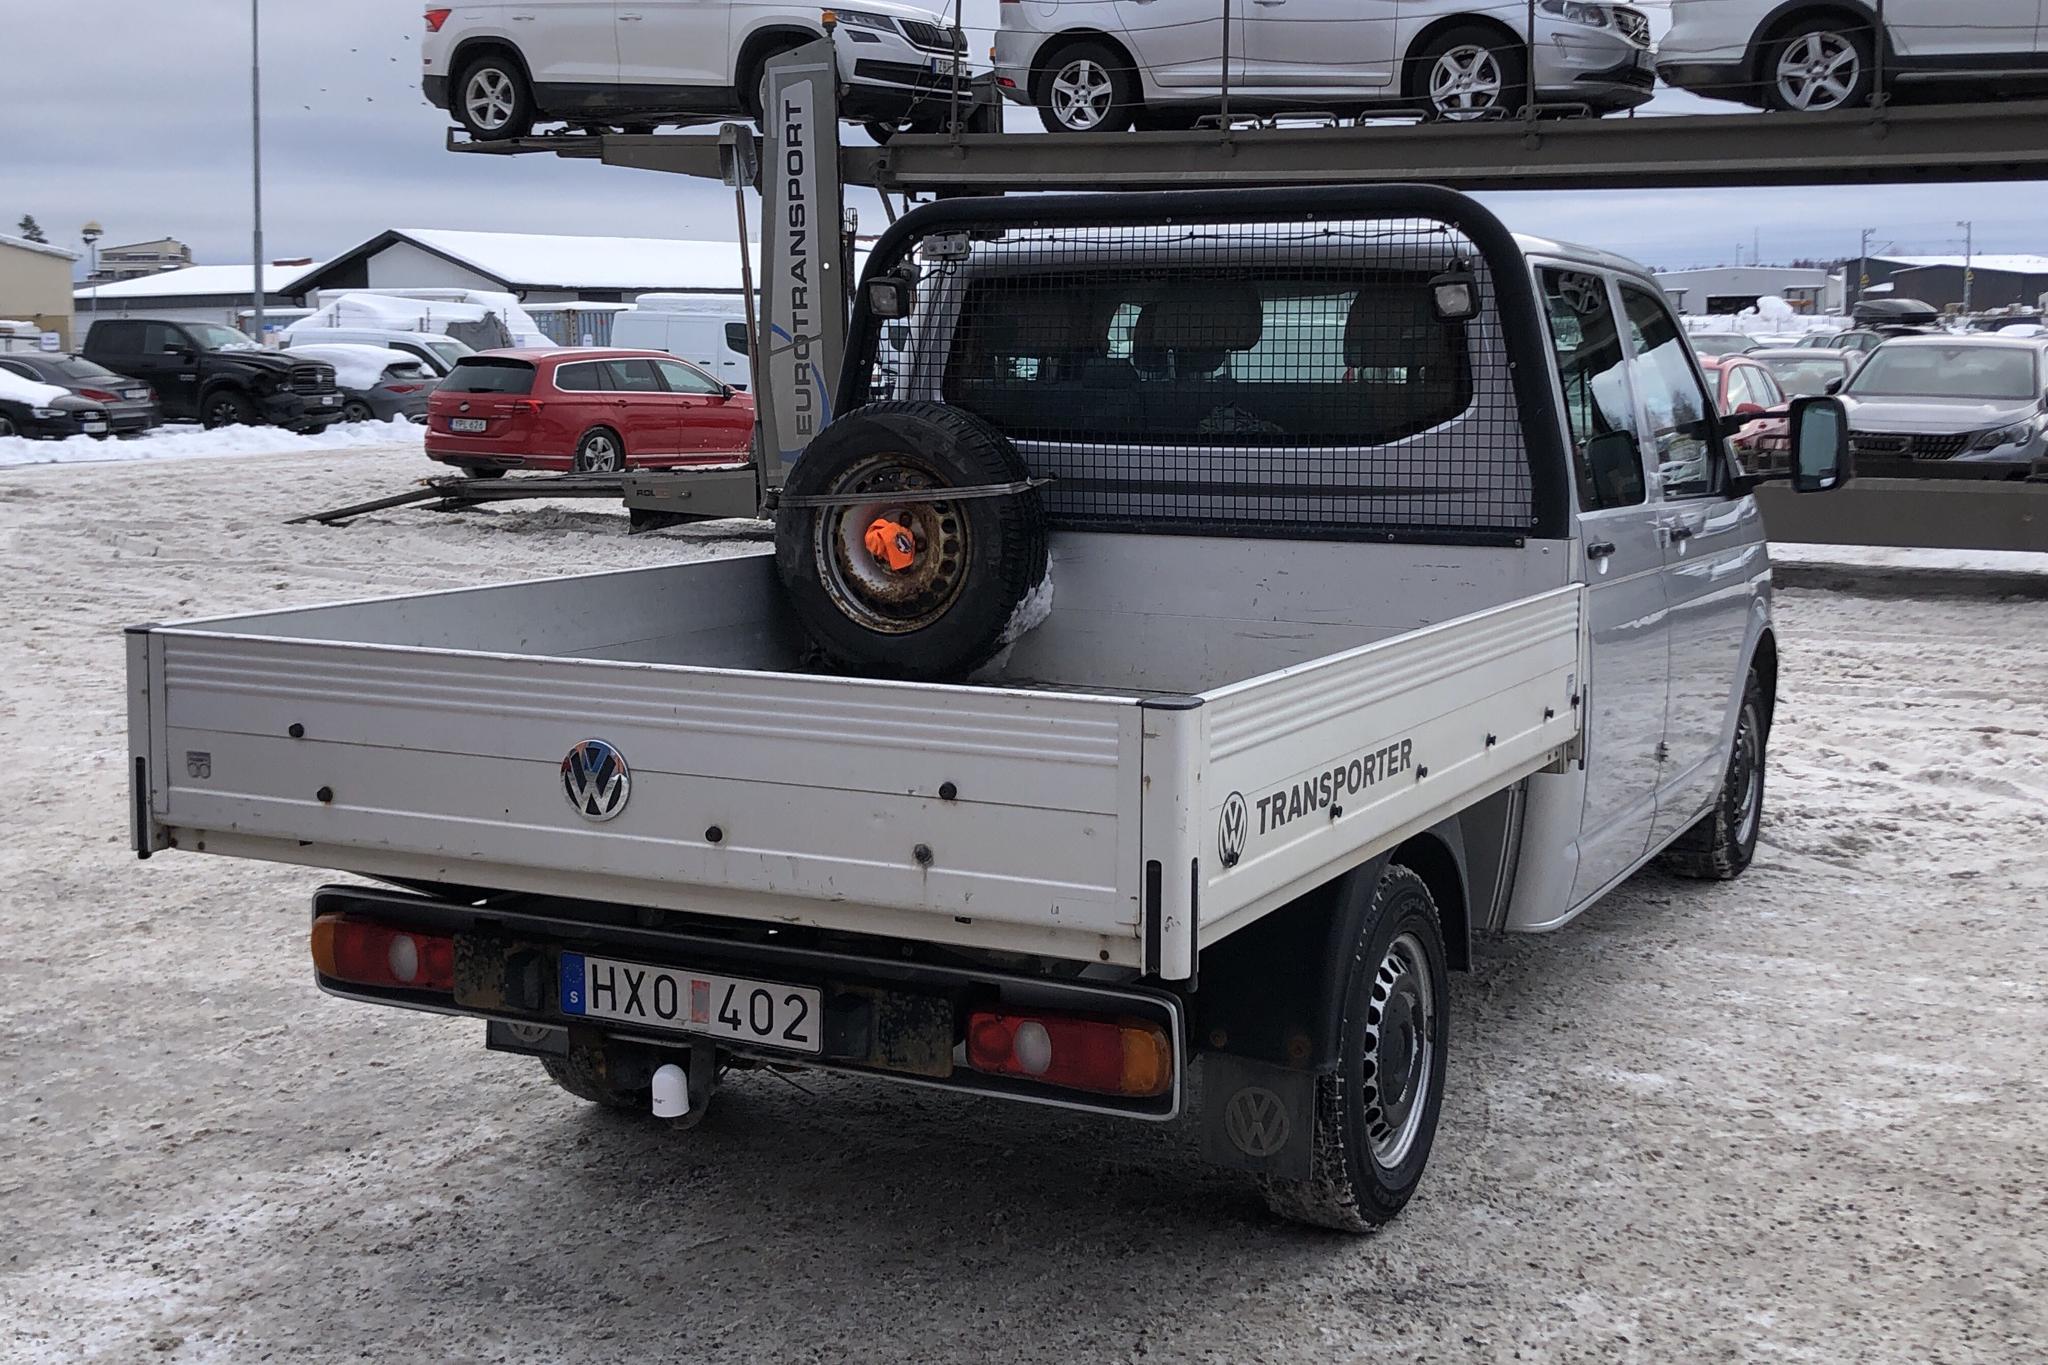 VW Transporter T5 2.5 TDI Pickup 4-motion (130hk) - 21 935 mil - Manuell - silver - 2009